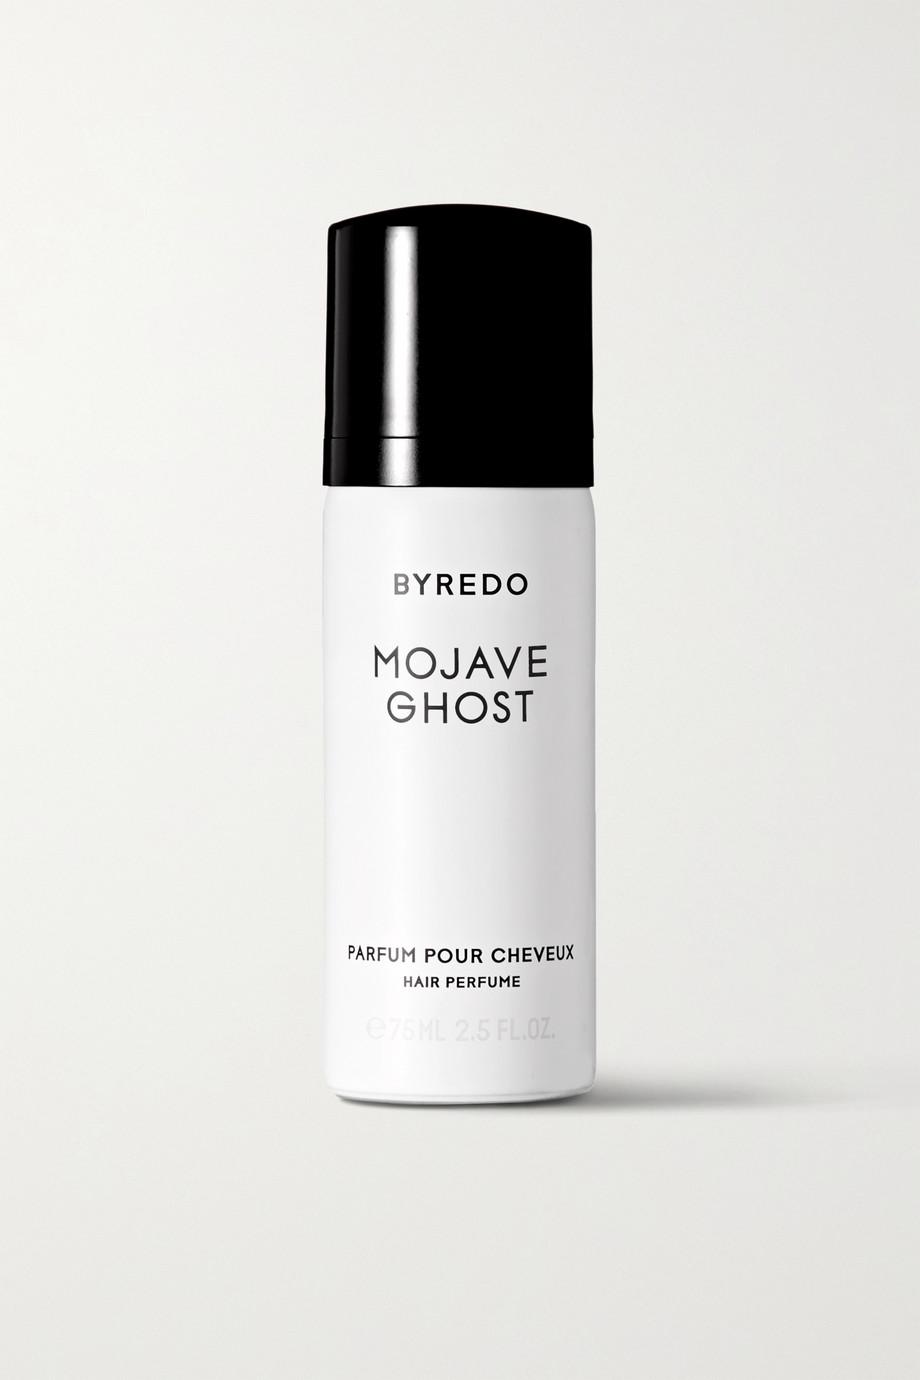 Mojave Ghost Hair Perfume, 75ml, by Byredo